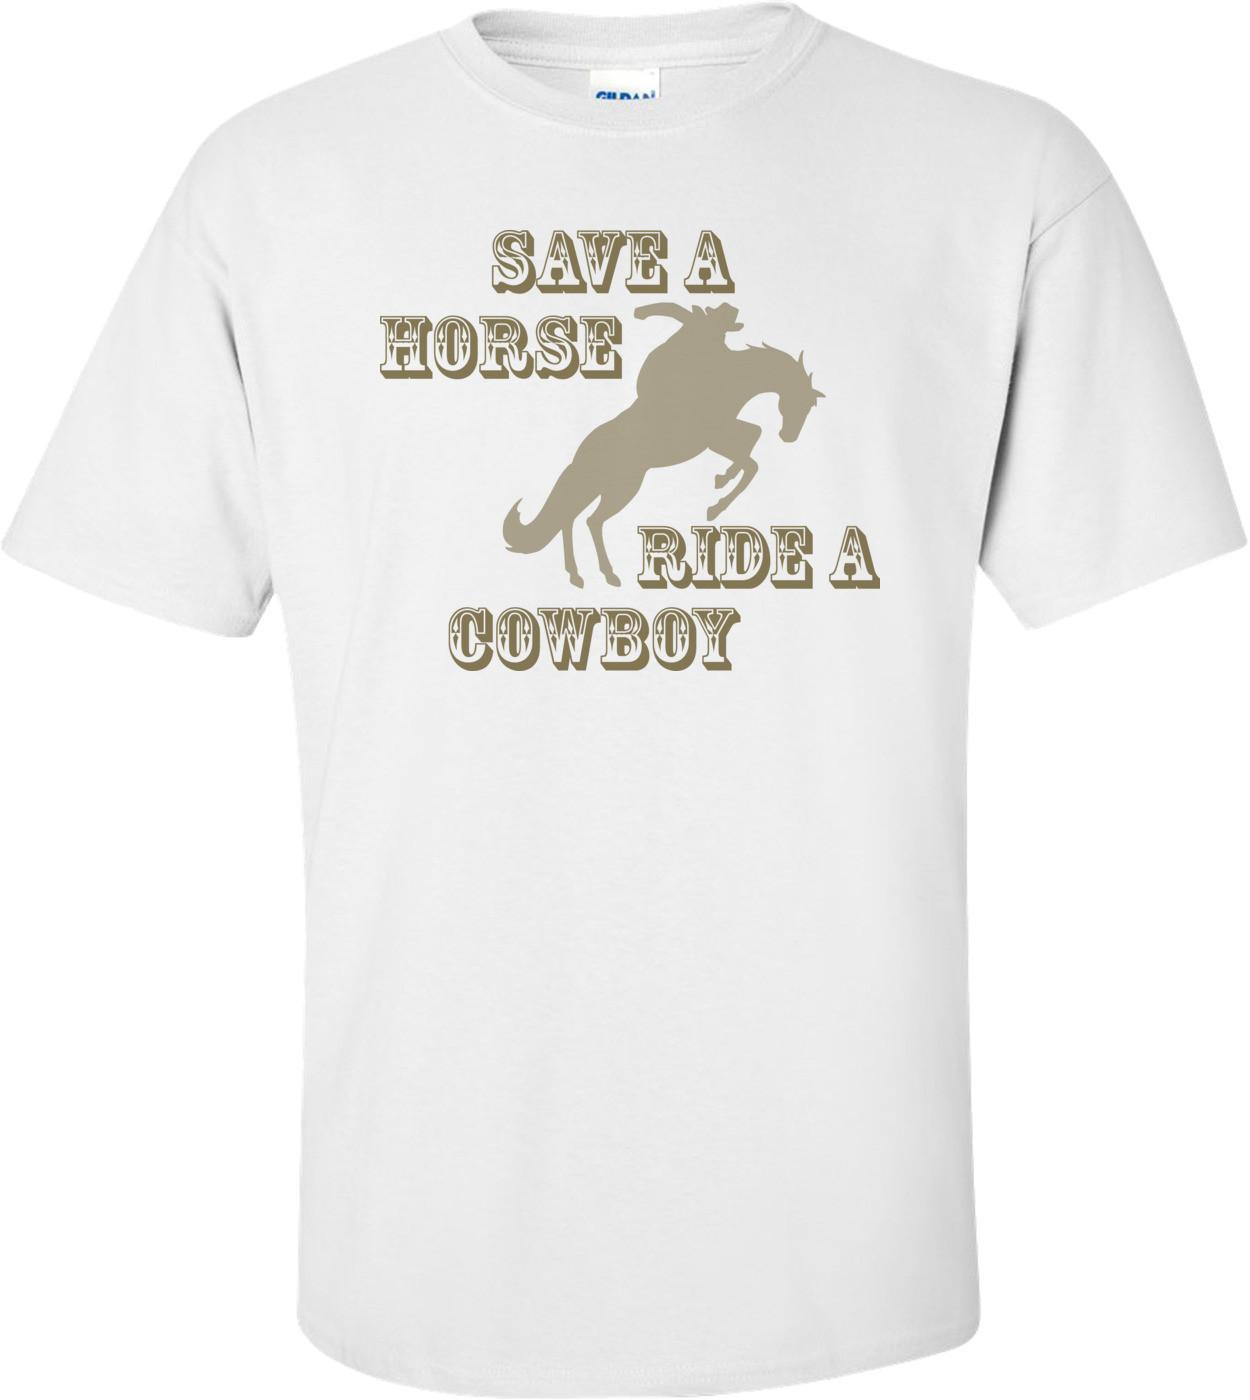 Save A Horse, Ride A Cowboy T-shirt